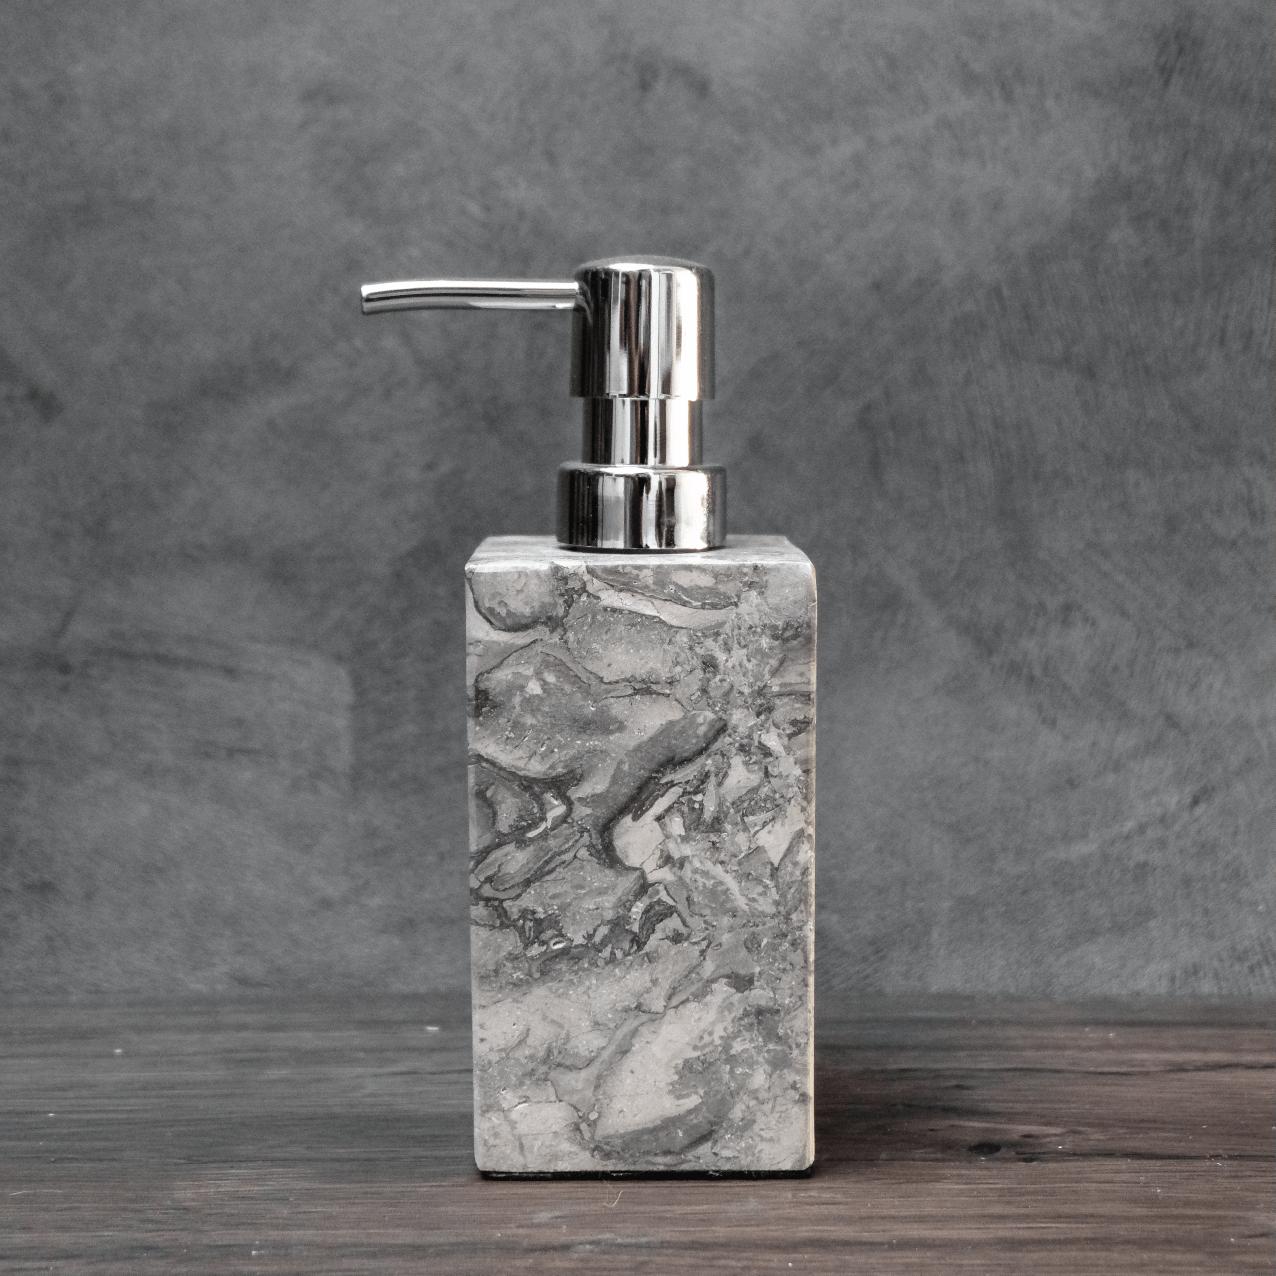 marble grey2 dispenser